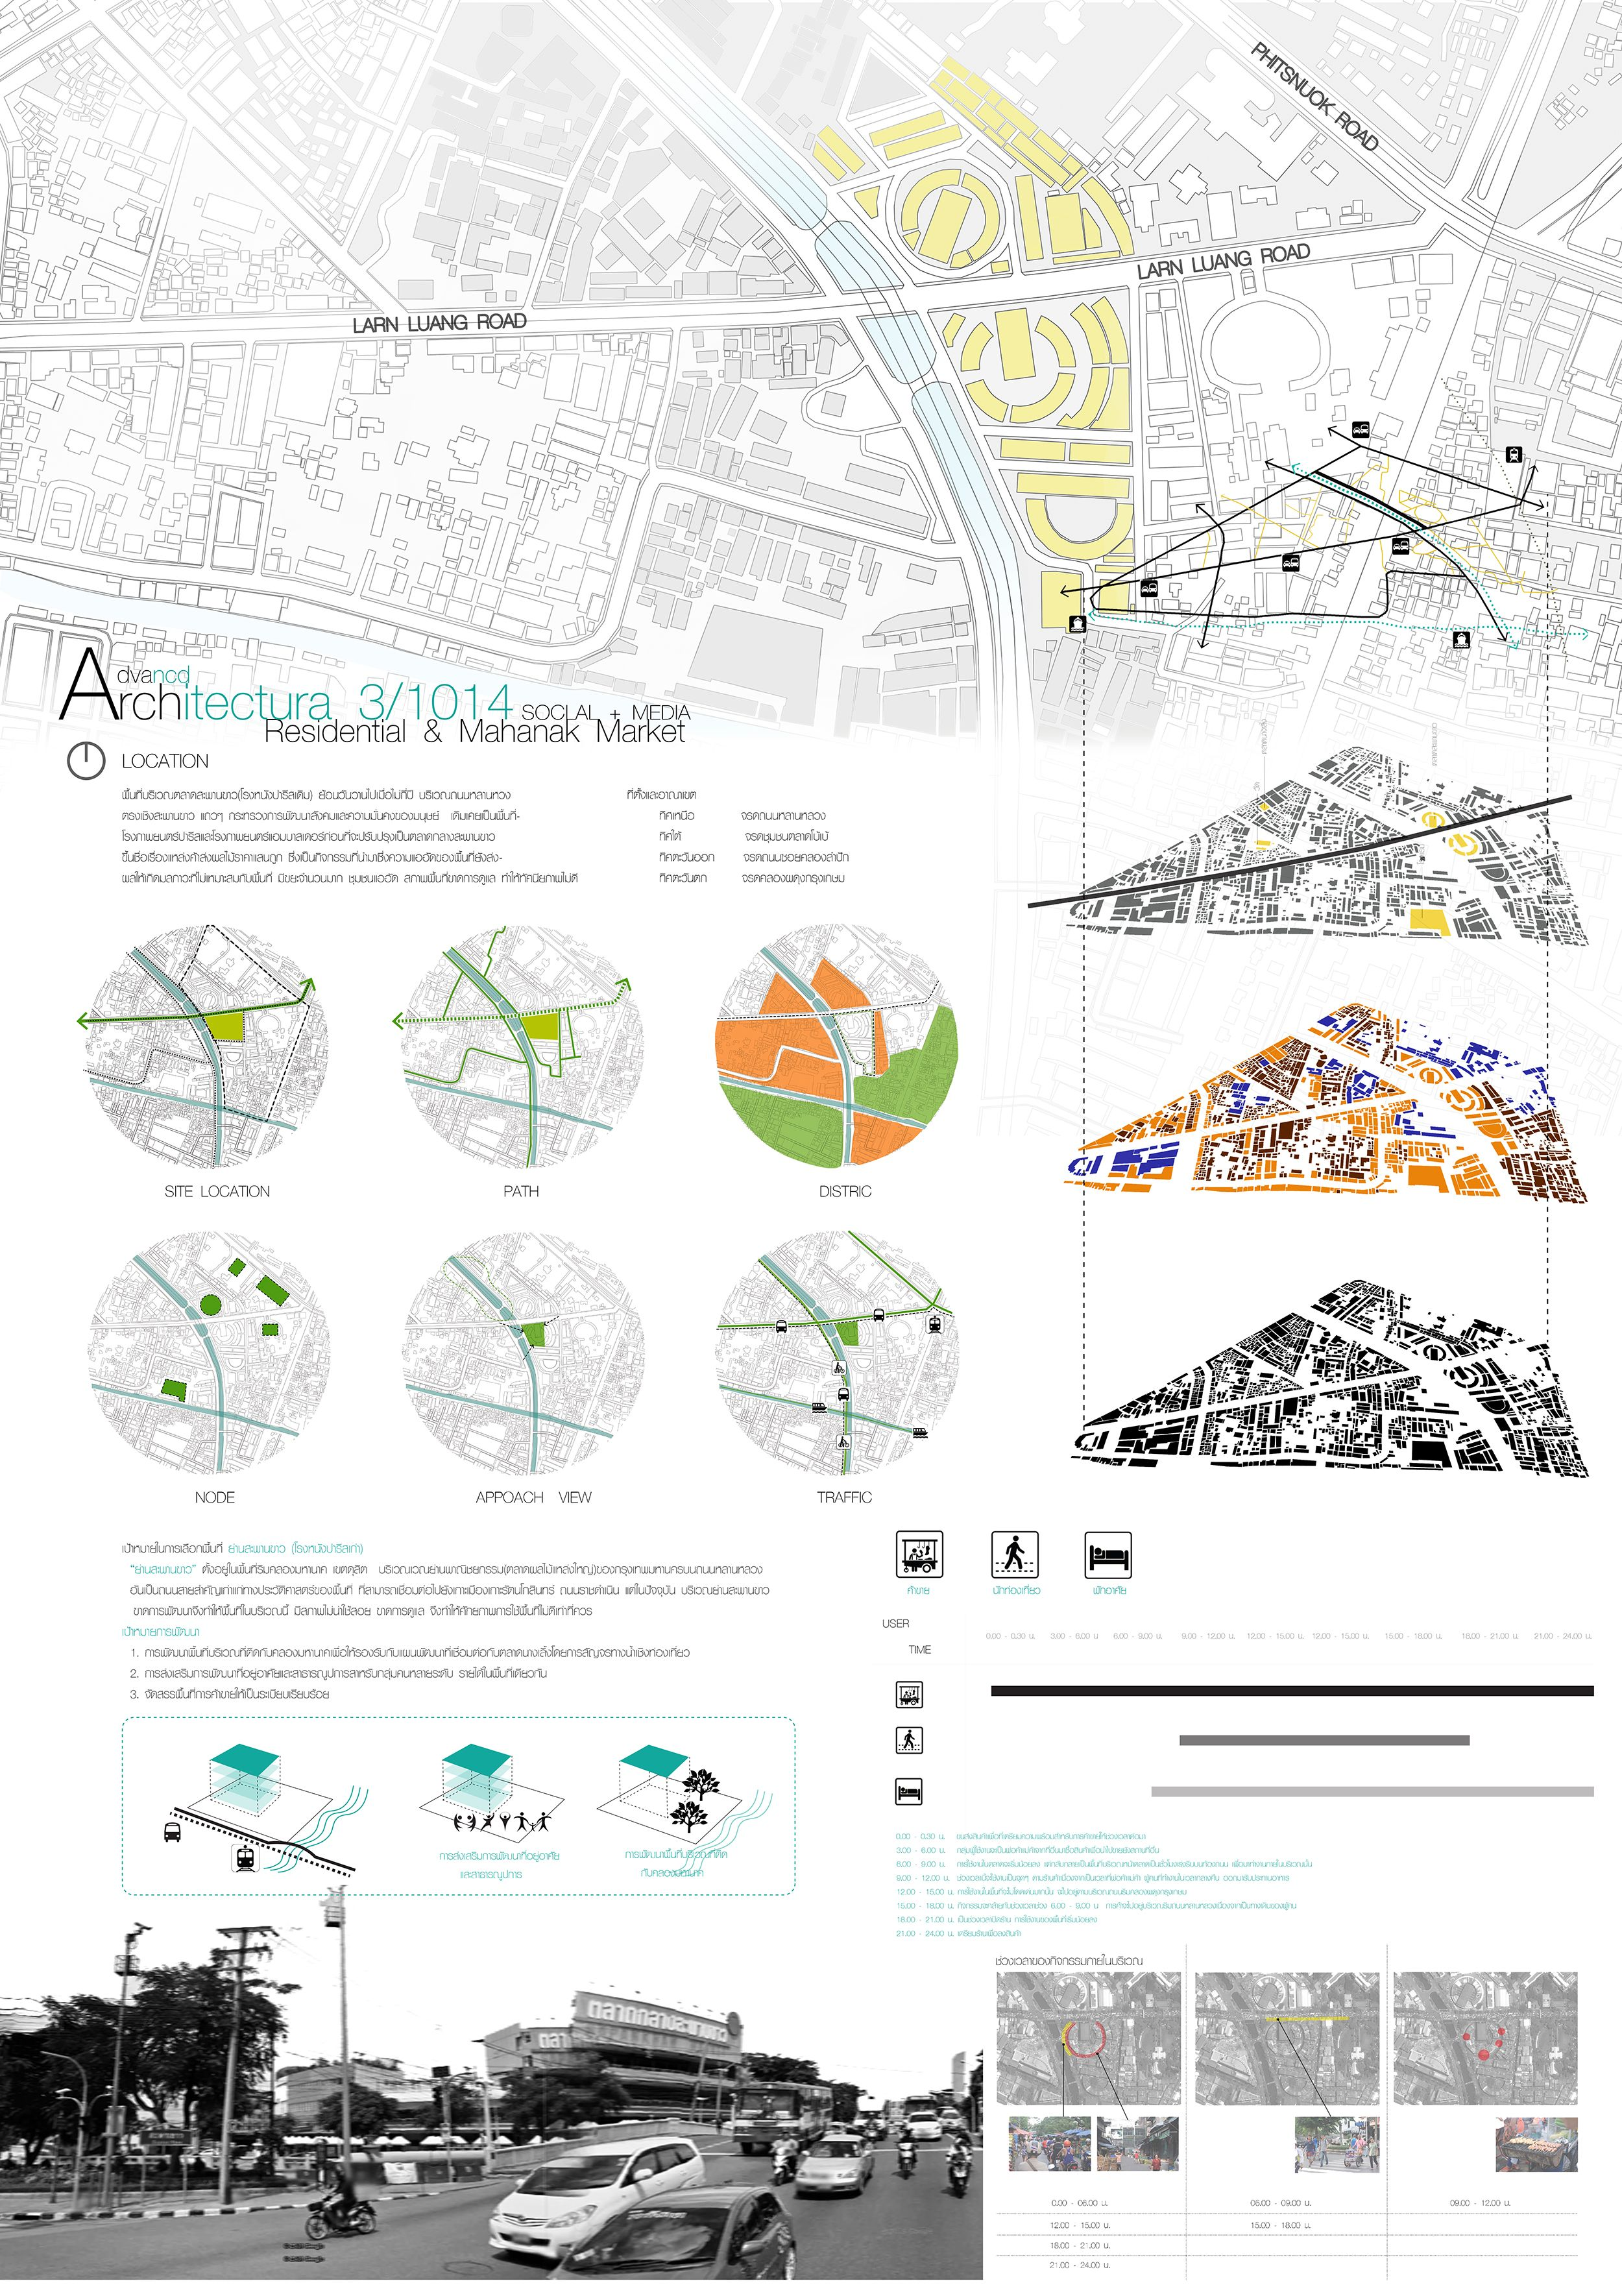 Architecture Site Analysis Diagram Balboa Instruments Wiring Pin By Supachai Premsmith On Urban Design